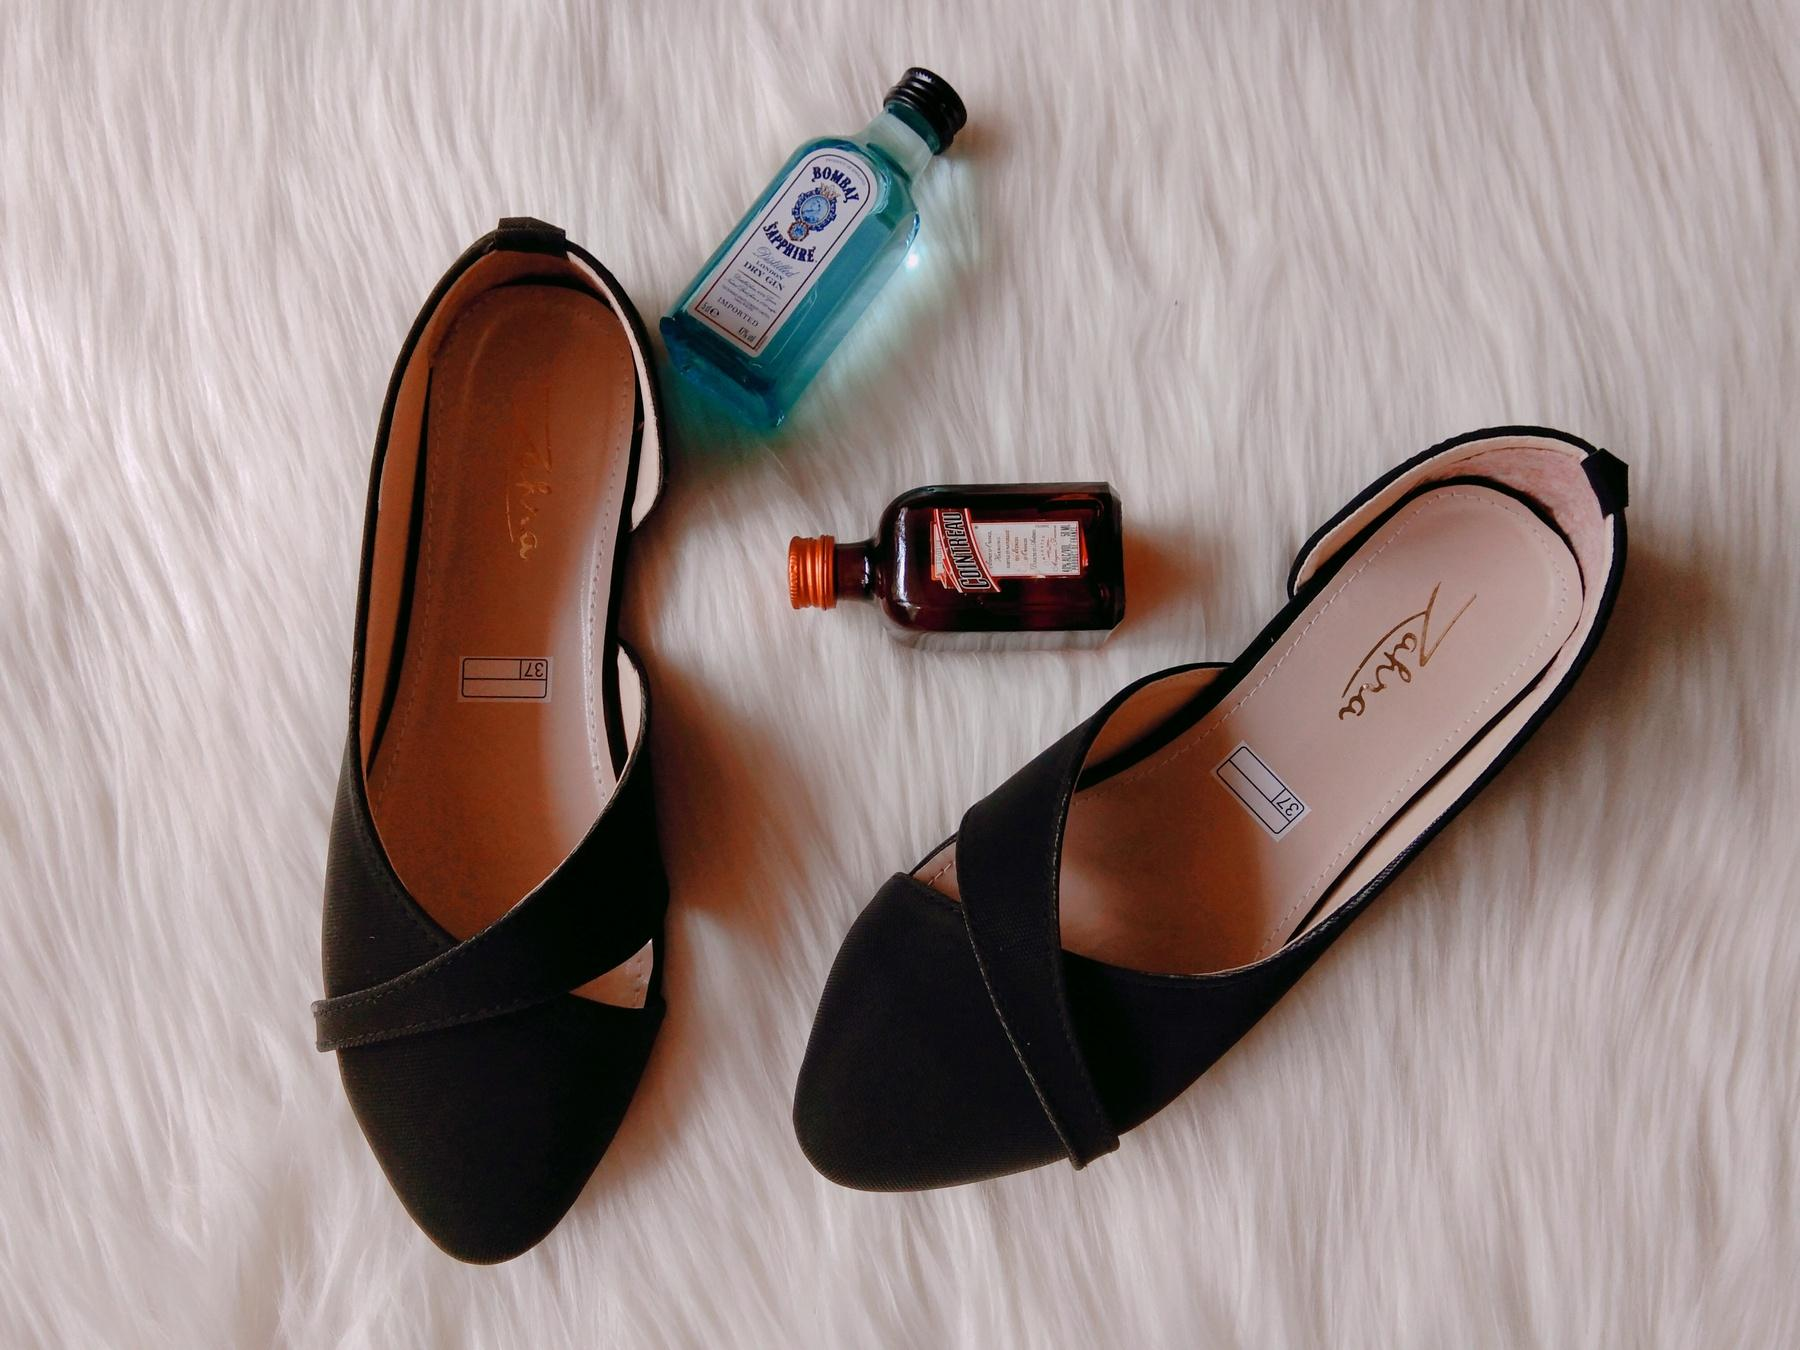 Isabel Sepatu Wanita Lucy Slip On Loafers Putih Best Buy Indonesia Amazara Delia Black Flatshoes Hitam 39 Arlaine Flat Shoes